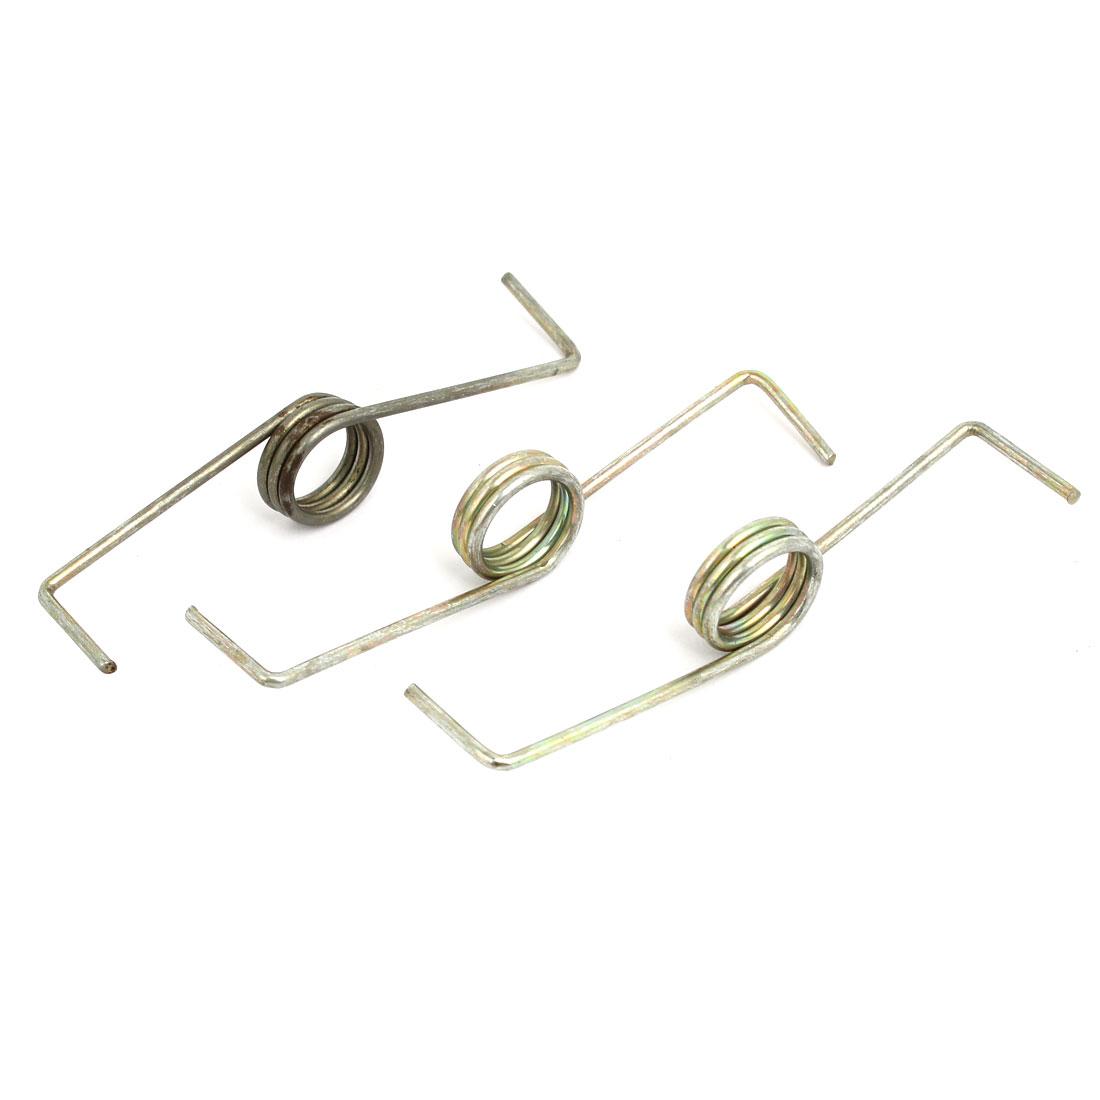 16mm Dia 75mm Length Metal Tension Spring Bronze Tone 3pcs